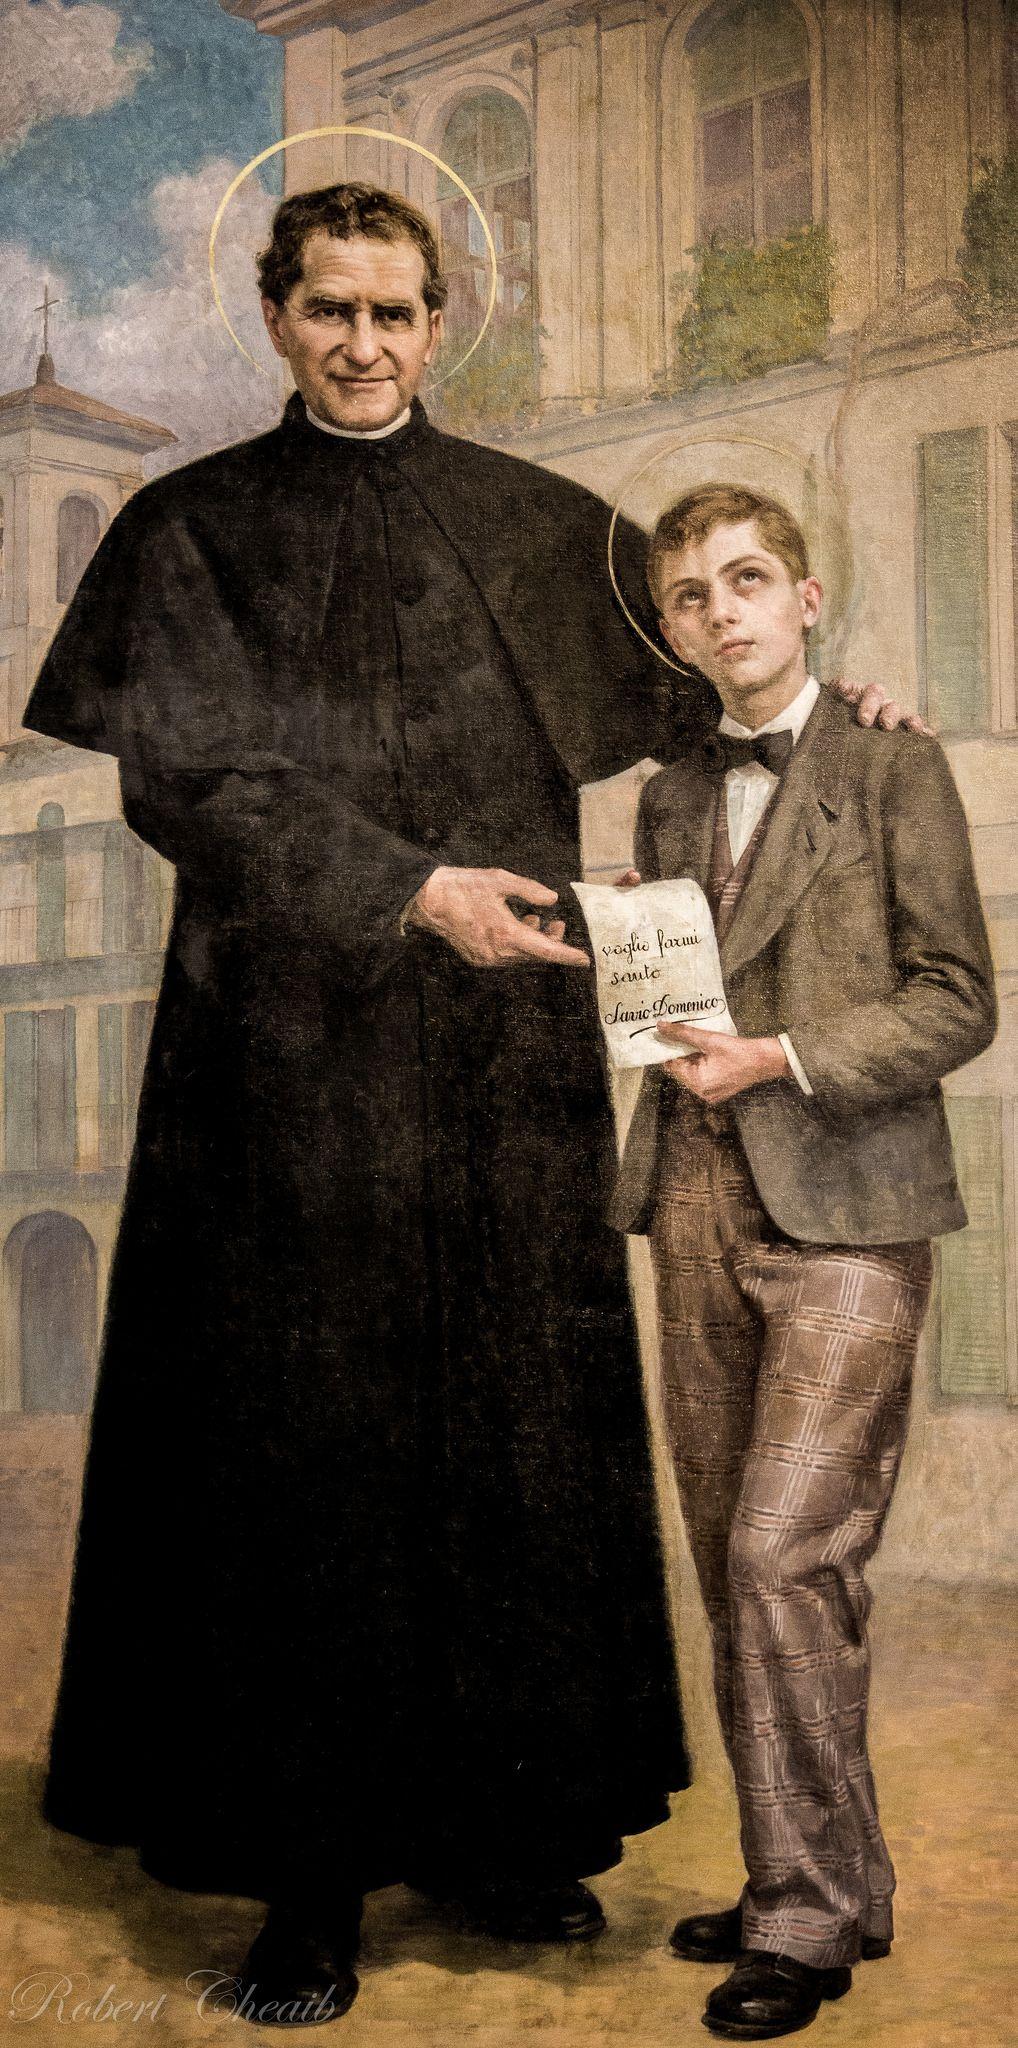 Domenico Savio | Saint dominic, St john bosco, Catholic saints